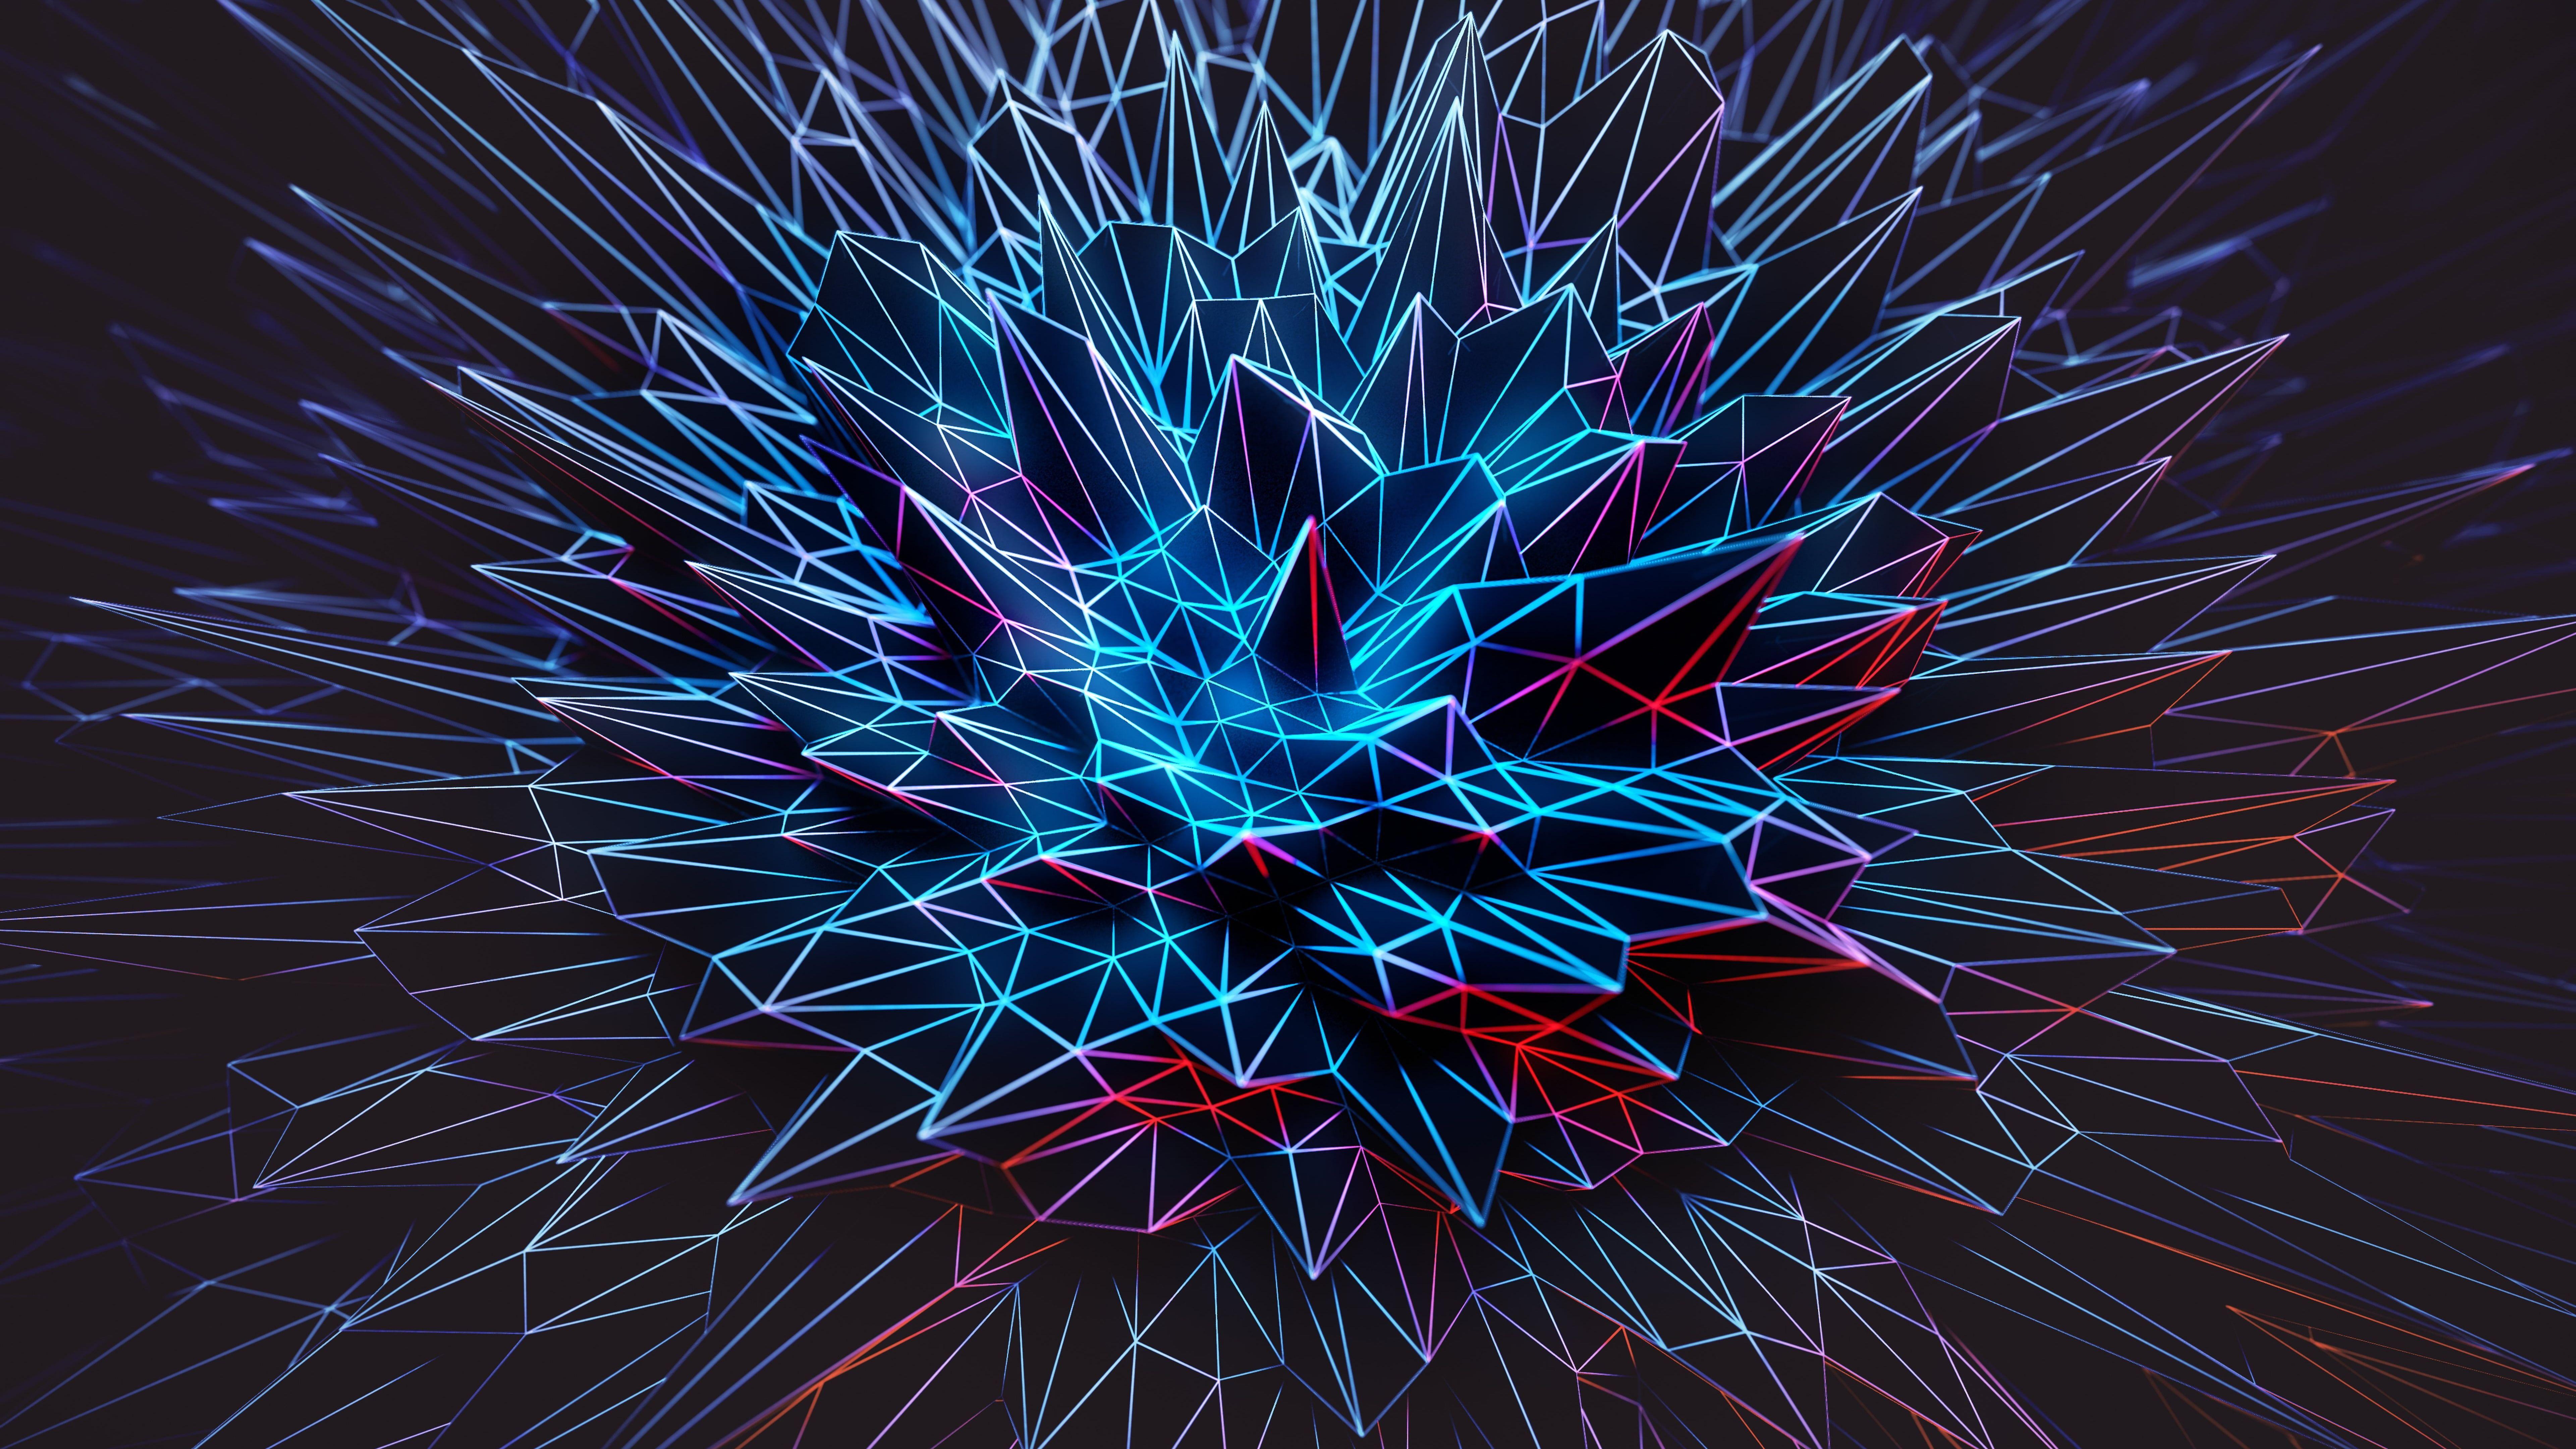 8k Uhd 3d Digital Art Abstract Art 8k Polygonal Spike Spikes Blue Electric Blue Darkness Graphics Graphic De Artistic Wallpaper Dark Wallpaper Abstract